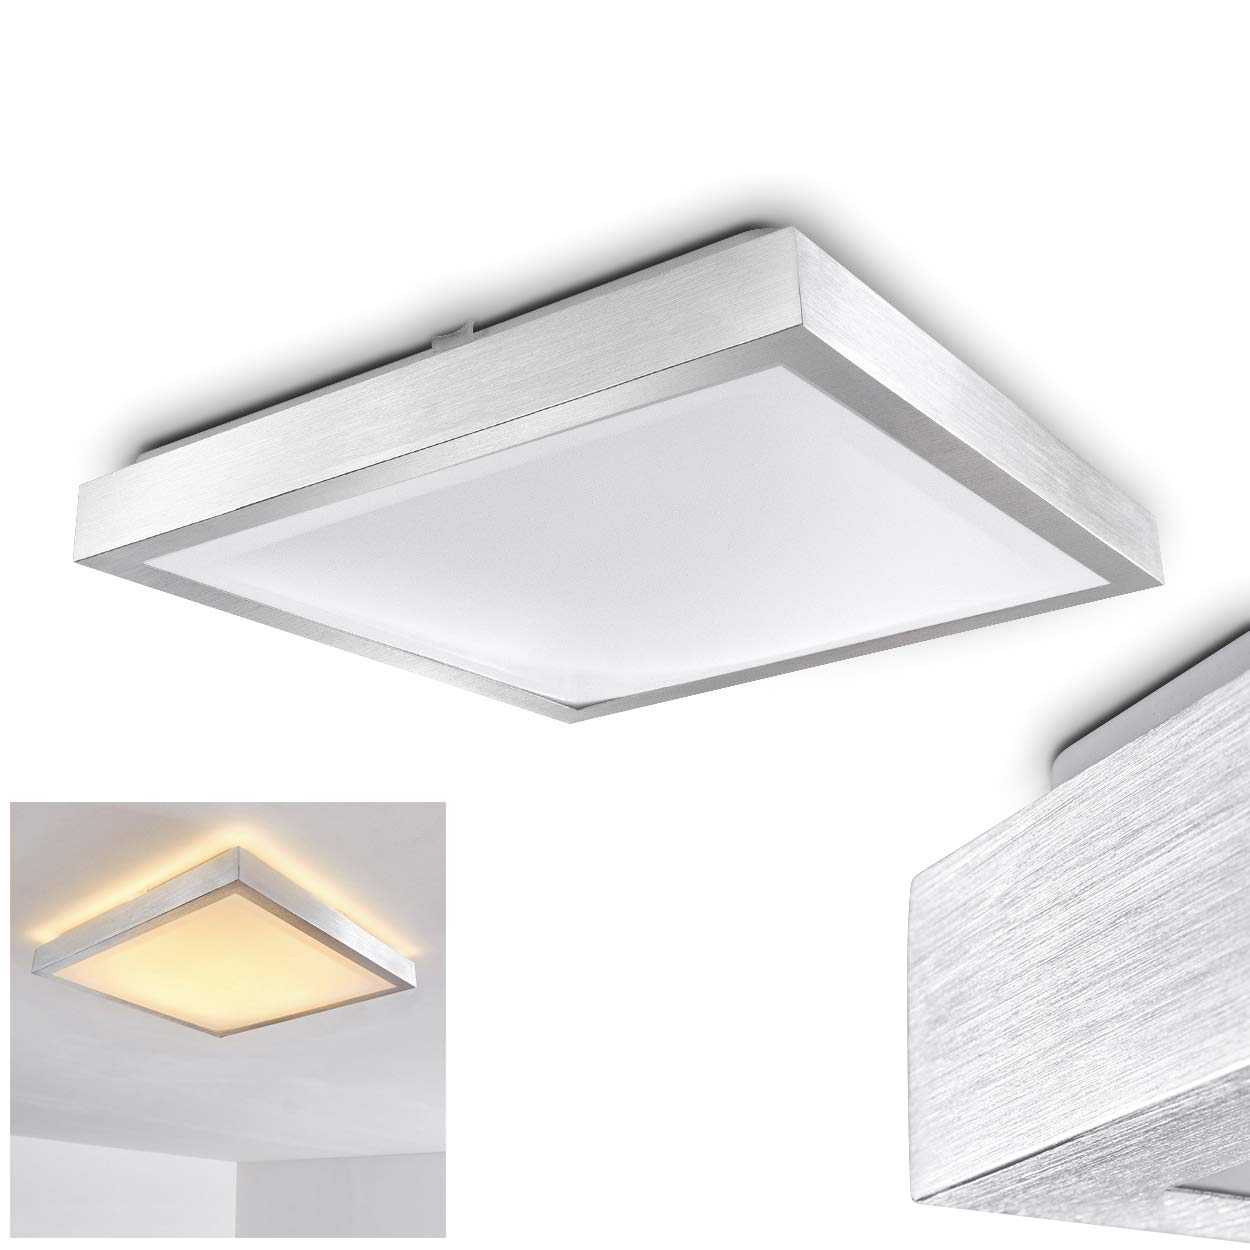 Square led ceiling lights eye catching design warm white light for bathroom kitchen corridor hallway dining room 3000 kelvin ip44 protection